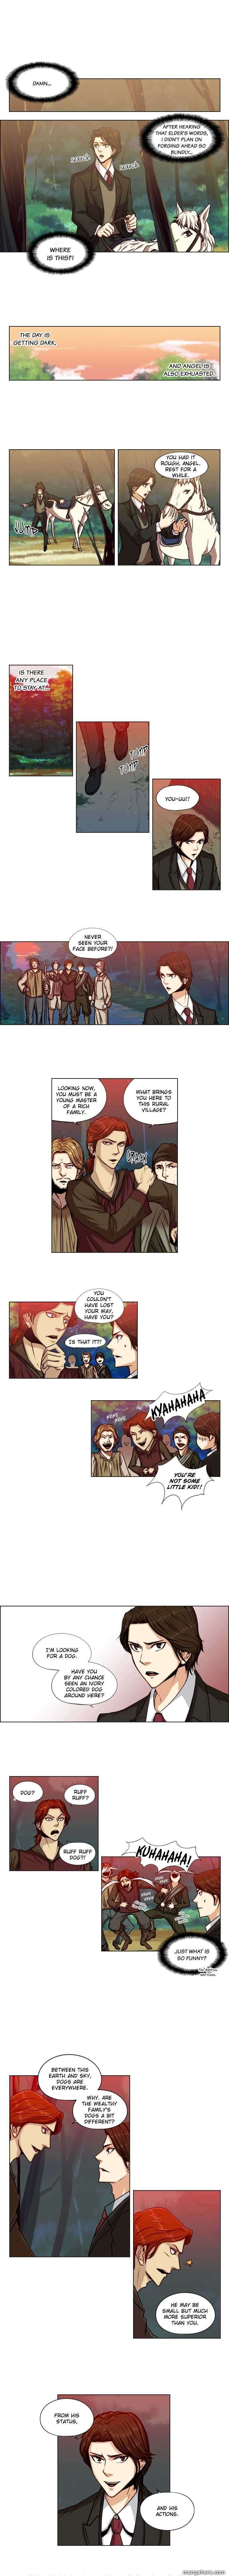 Serendipity 3 Page 1